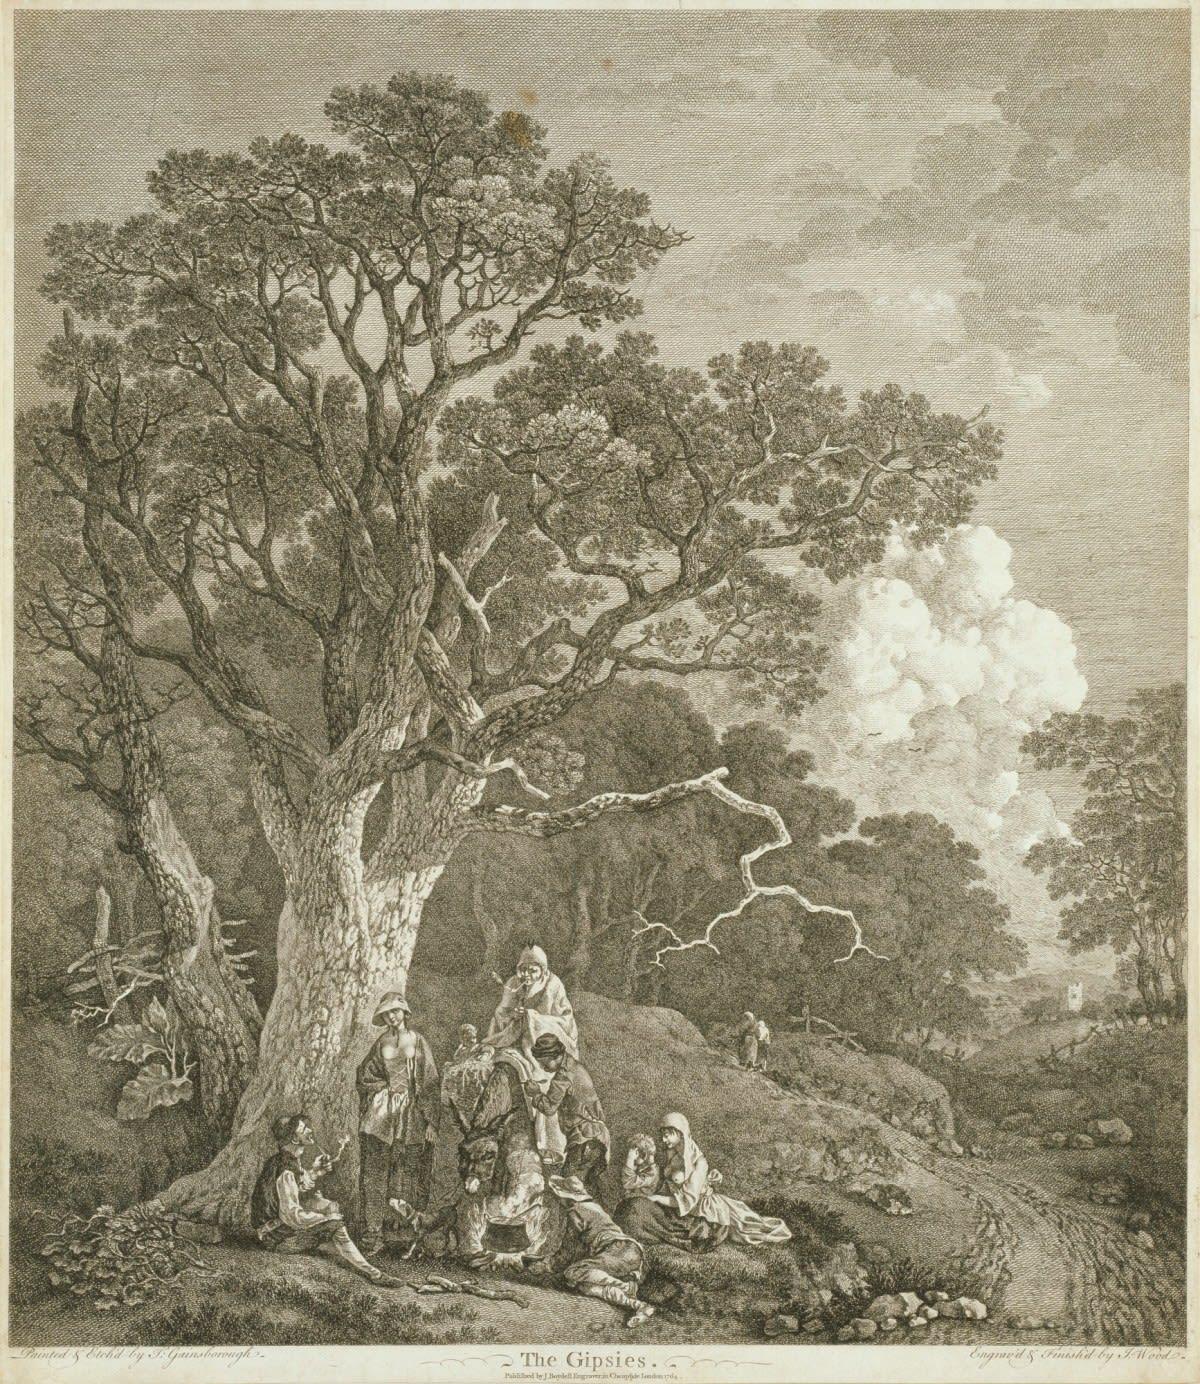 Thomas Gainsborough, The Gypsies, c.1724 Etching